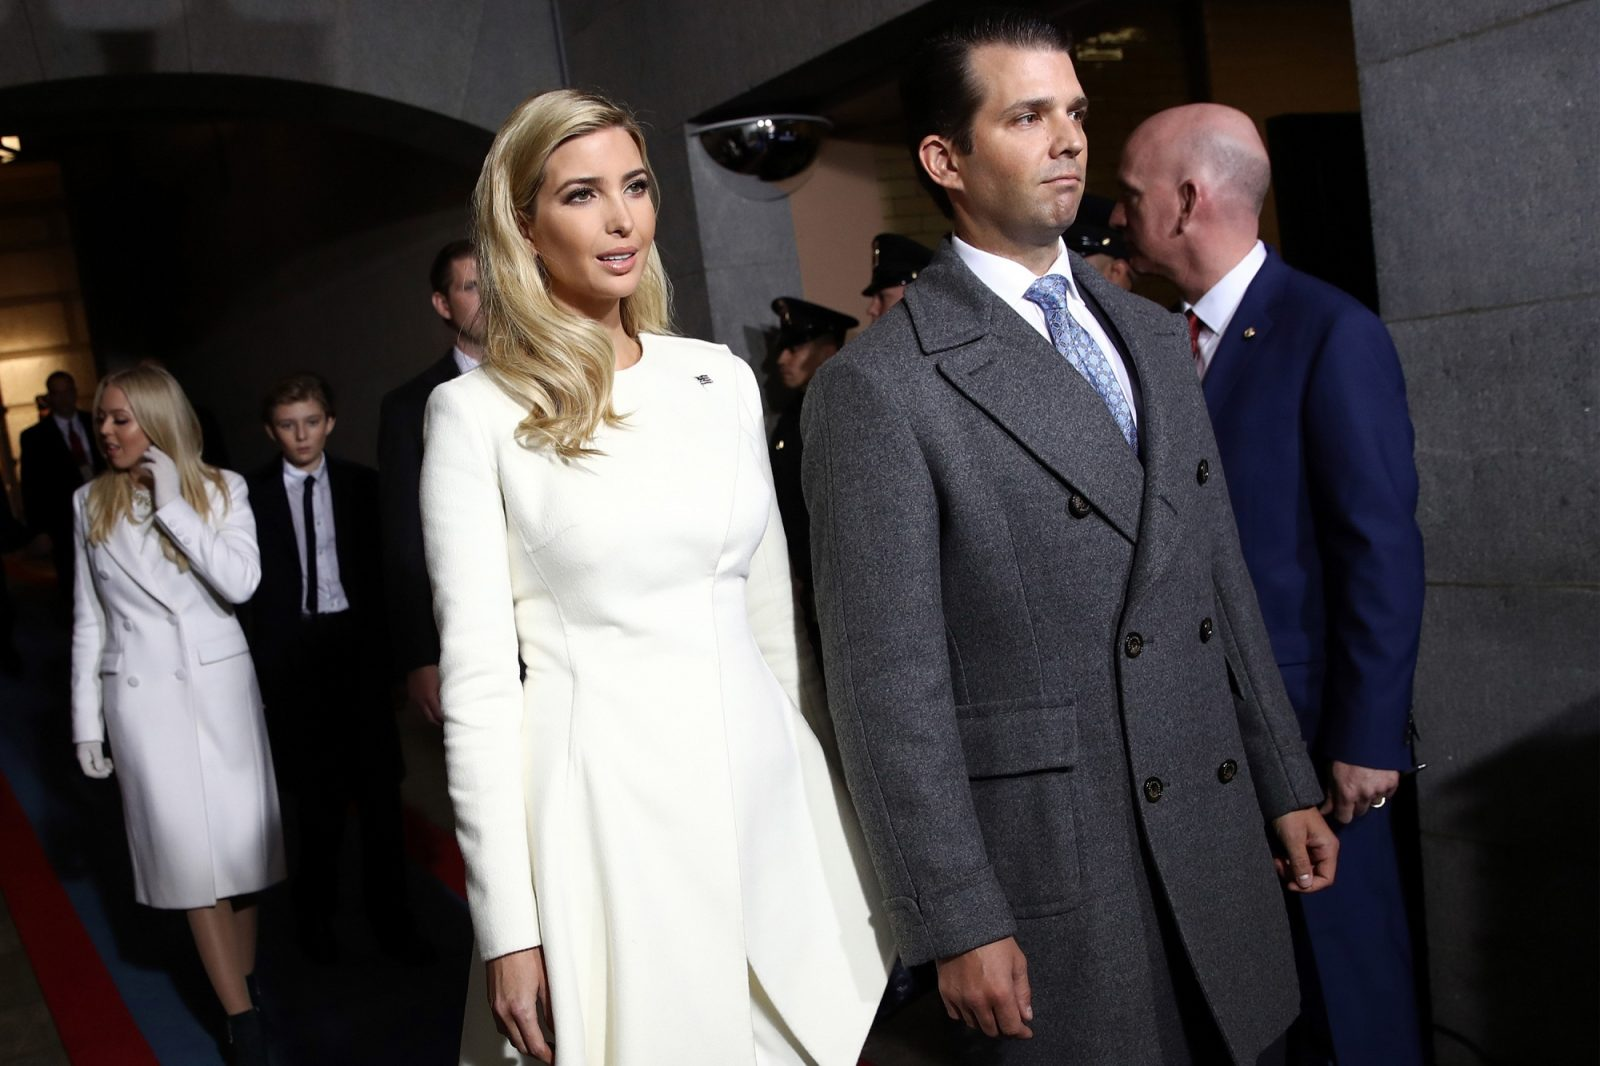 Ivanka and Donald Trump Jr. Were Alm